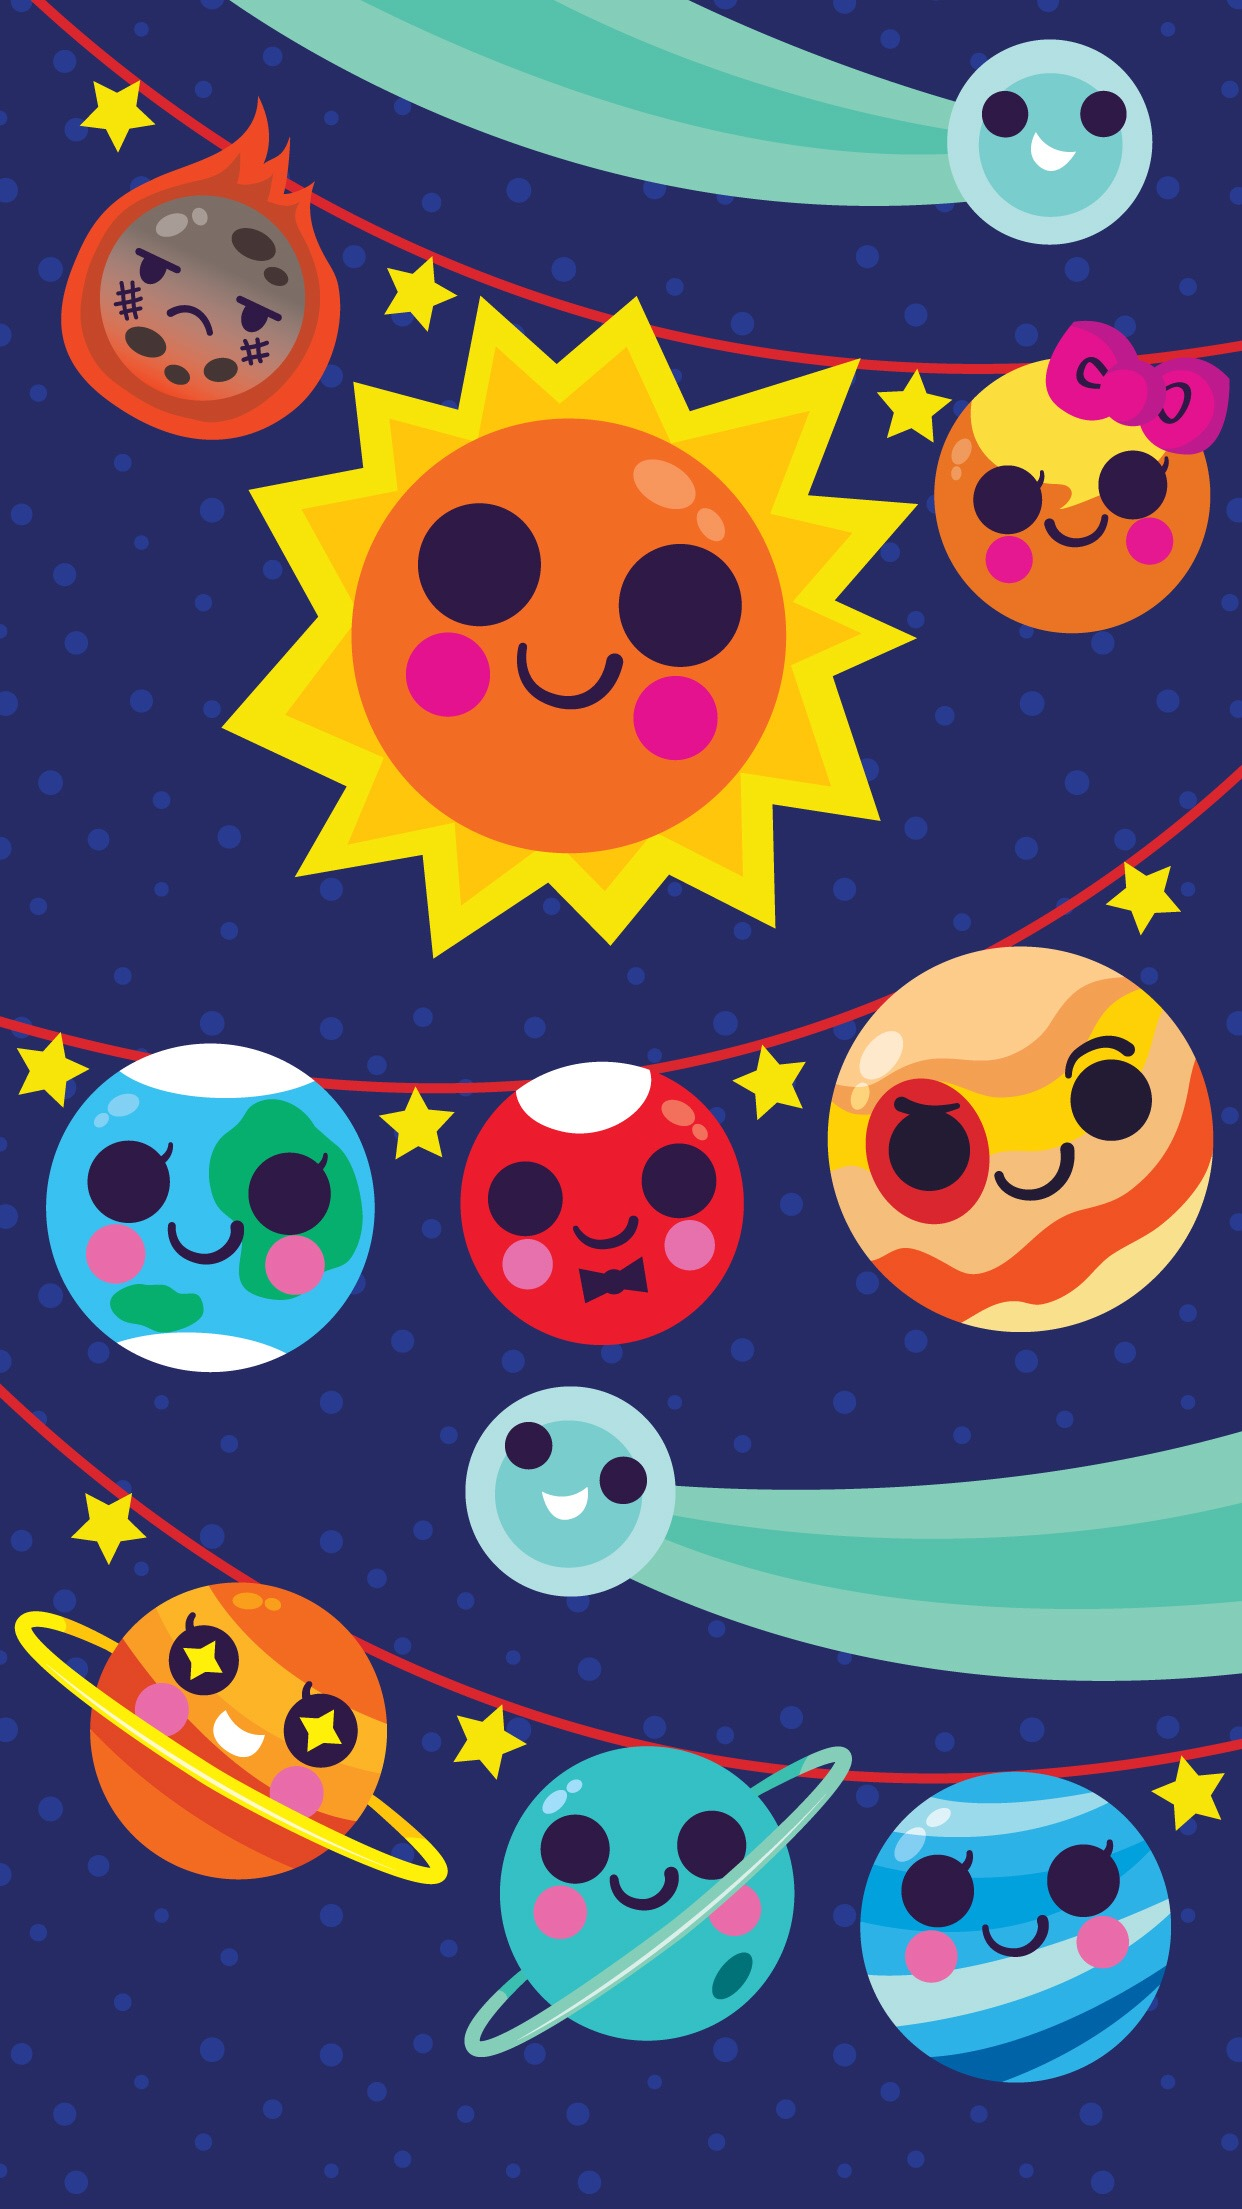 Space Holiday Garland Wallpaper